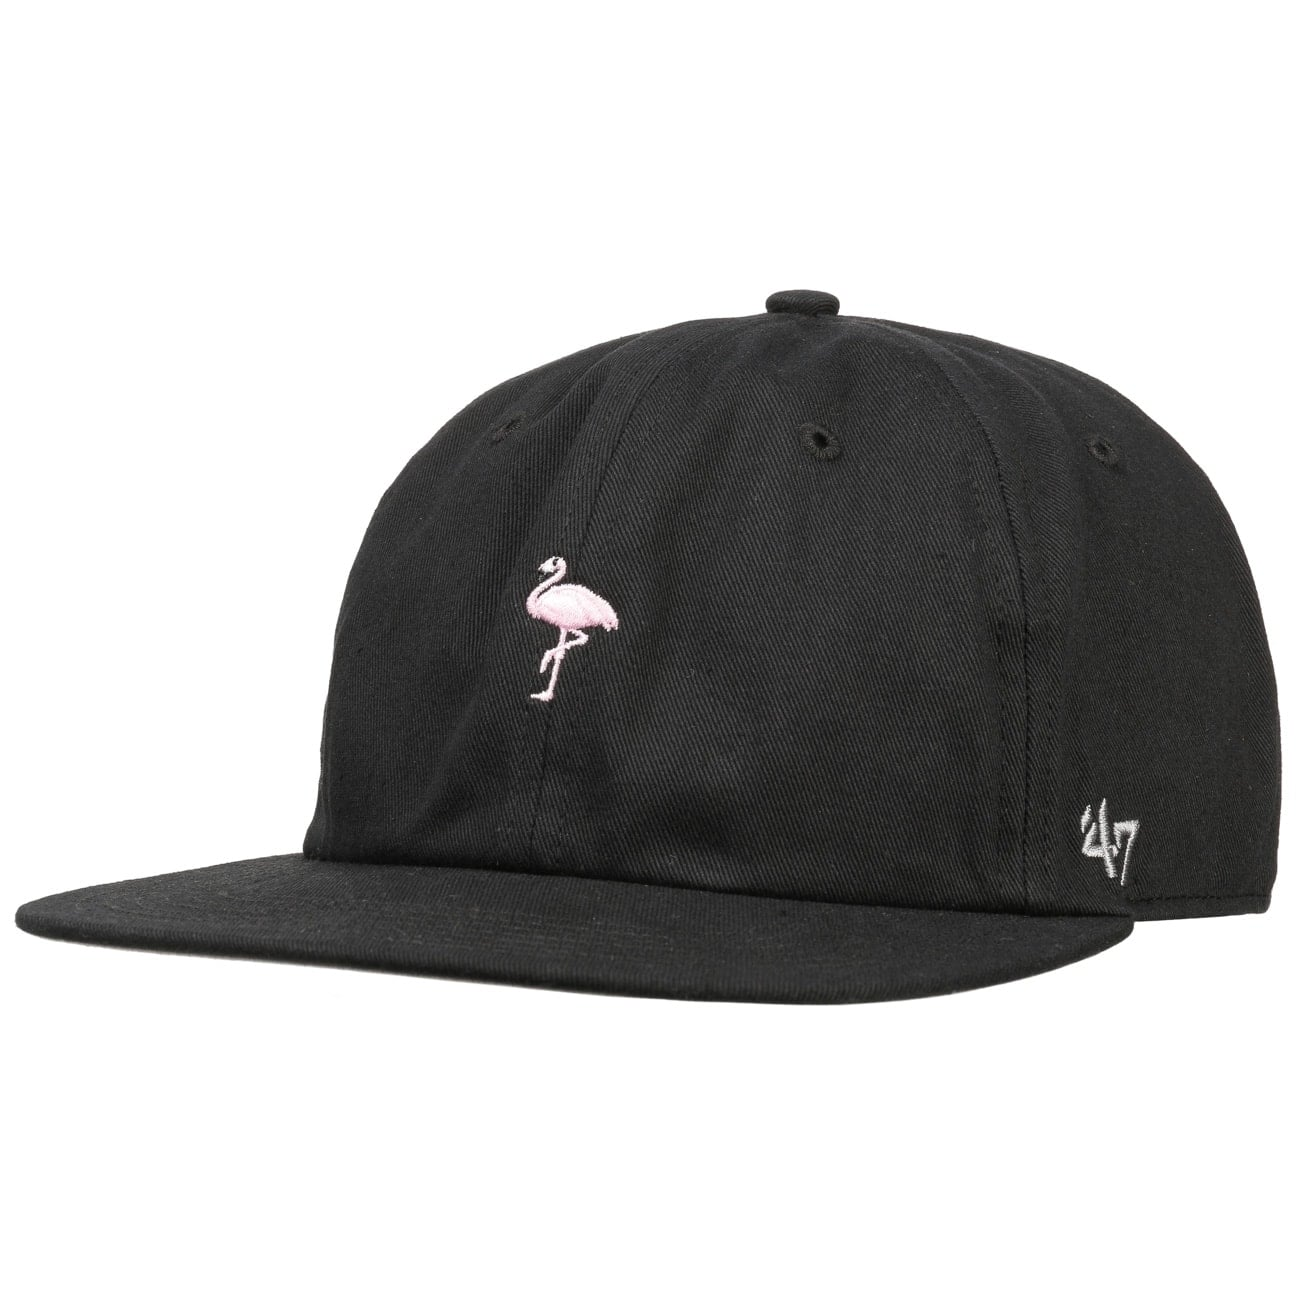 Casquette Beams Icon Marlins by 47 Brand  casquette de baseball